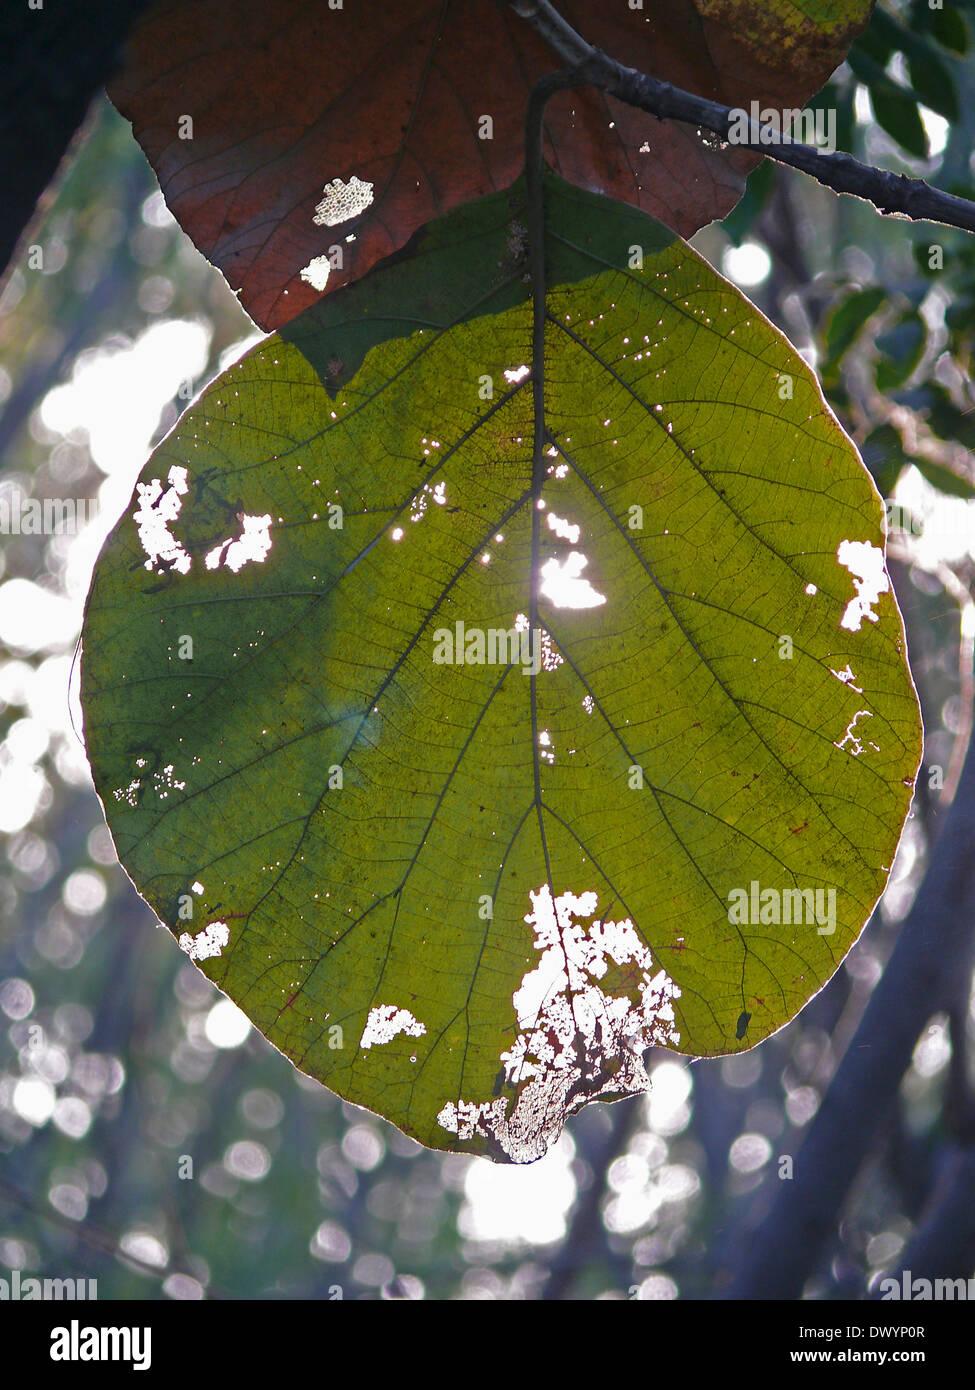 Teakbaum blatt  Blatt der Teak-Baum, Tectona Grandis L. F Stockfoto, Bild: 67607479 ...